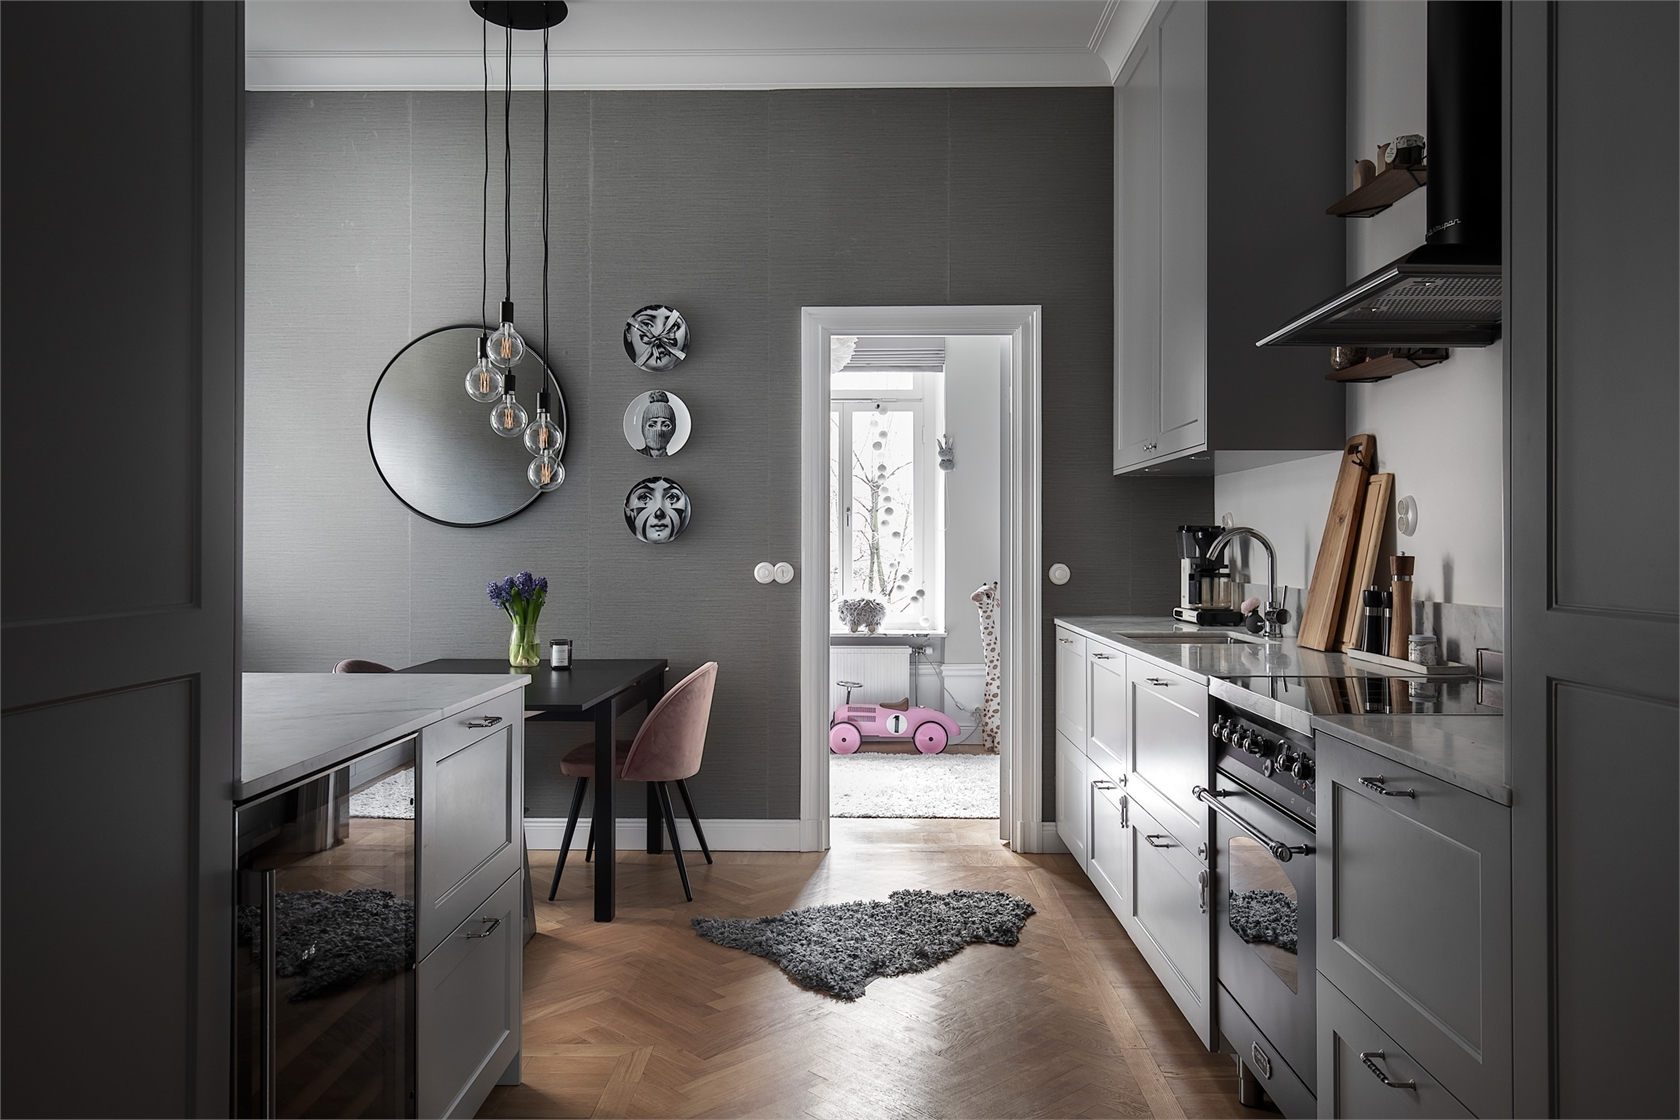 28606 kitchen gray walls gray cabinets